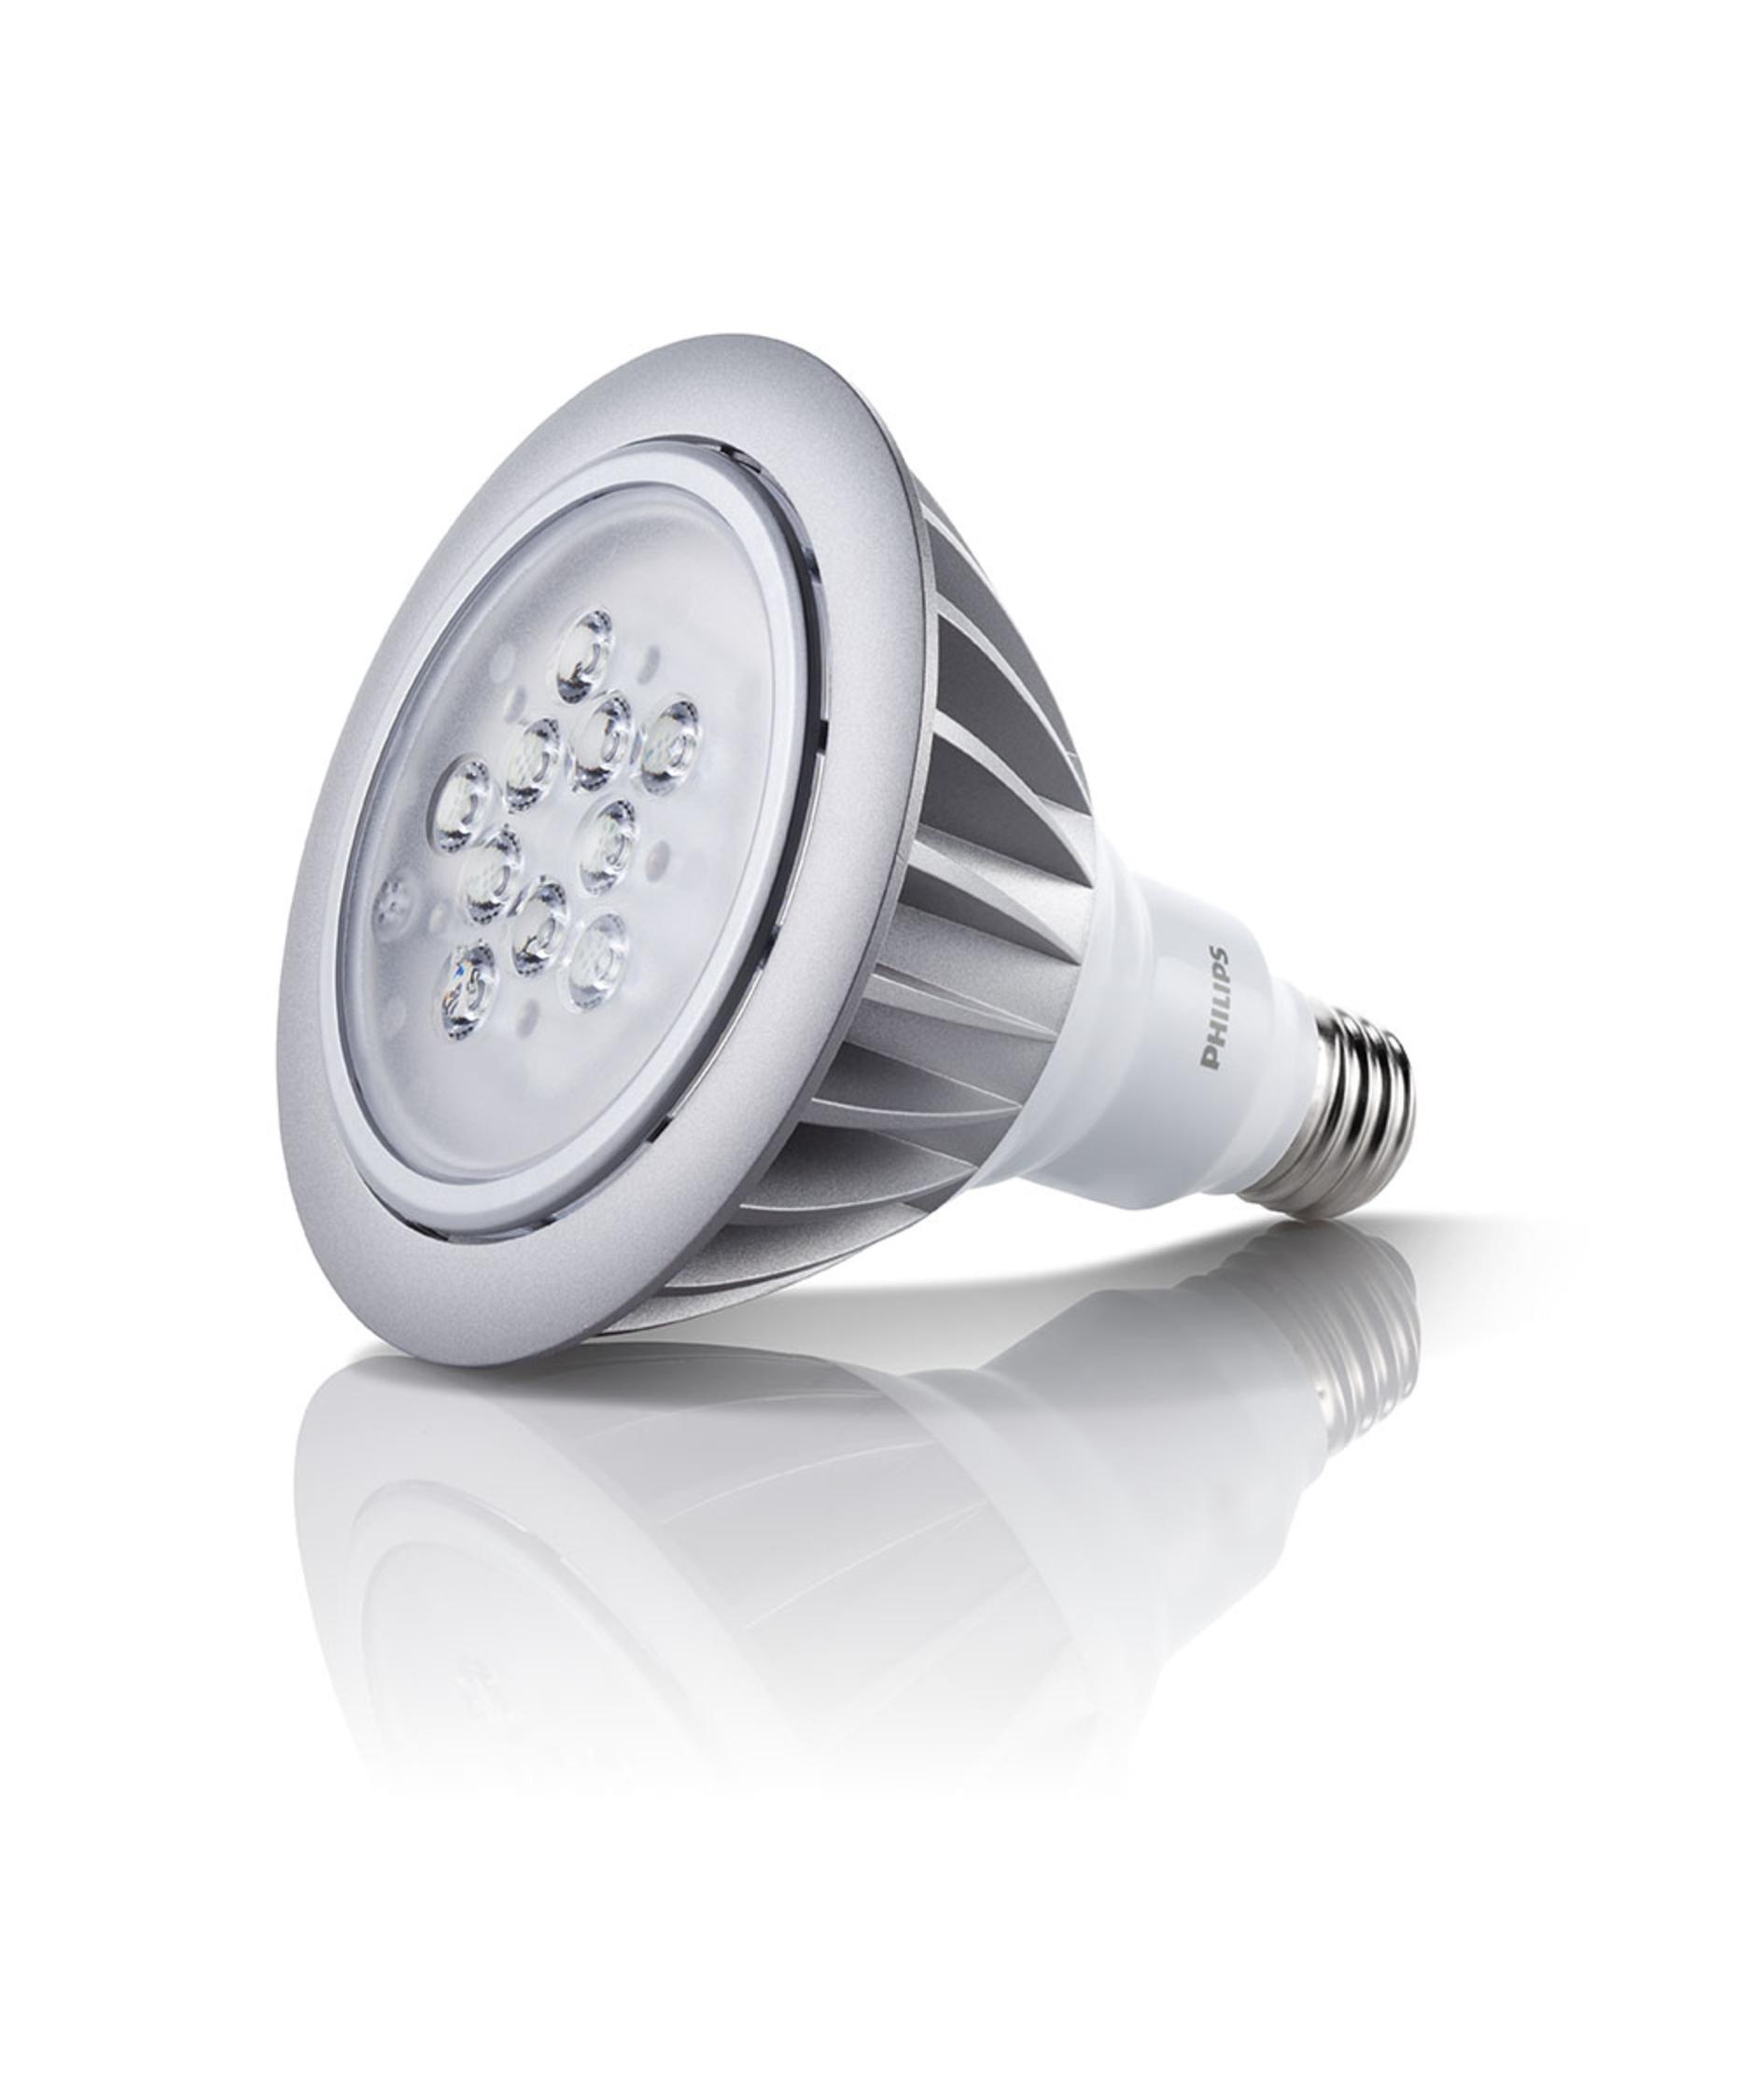 outdoor led flood light bulb capitol lighting 1